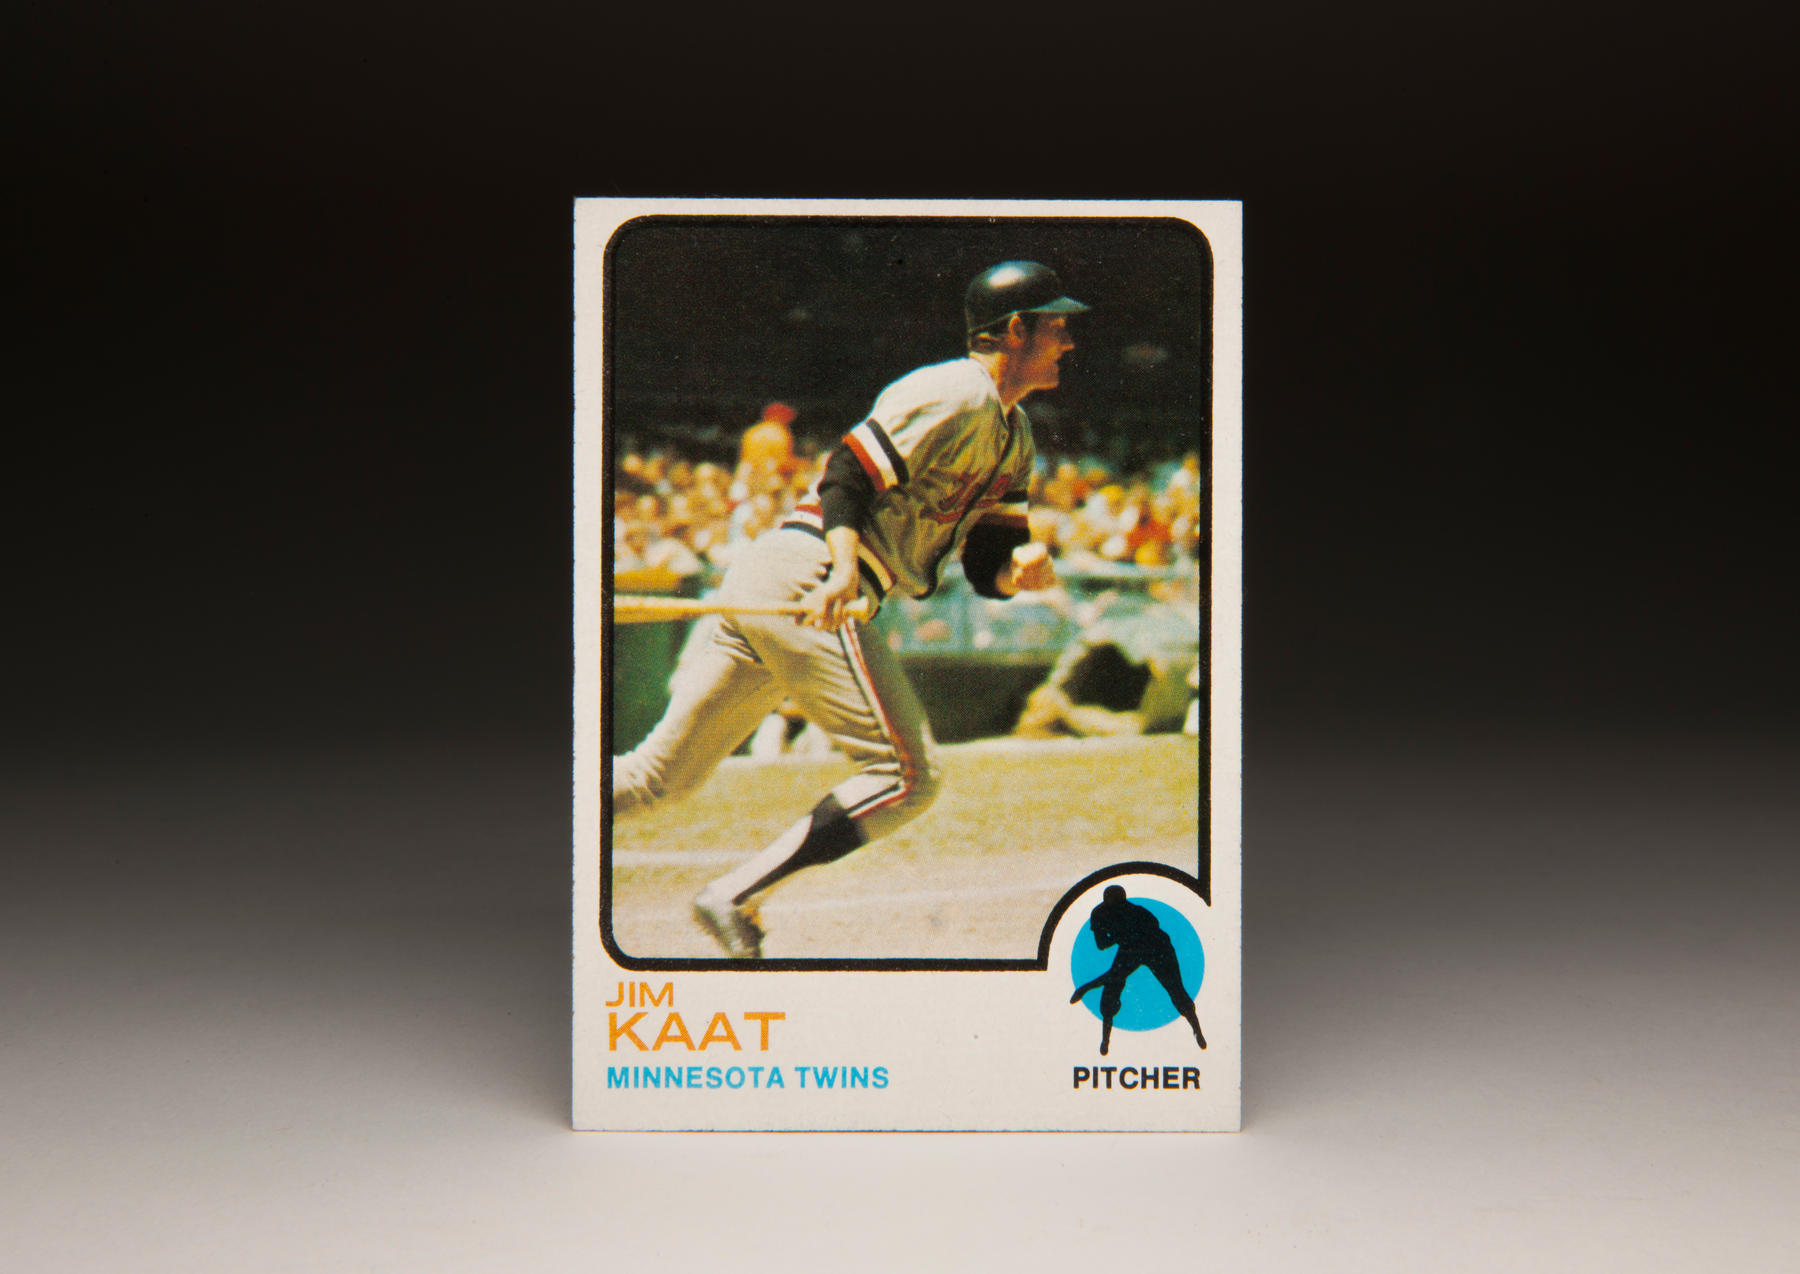 1973 Jim Kaat Topps card. (Milo Stewart Jr. / National Baseball Hall of Fame)